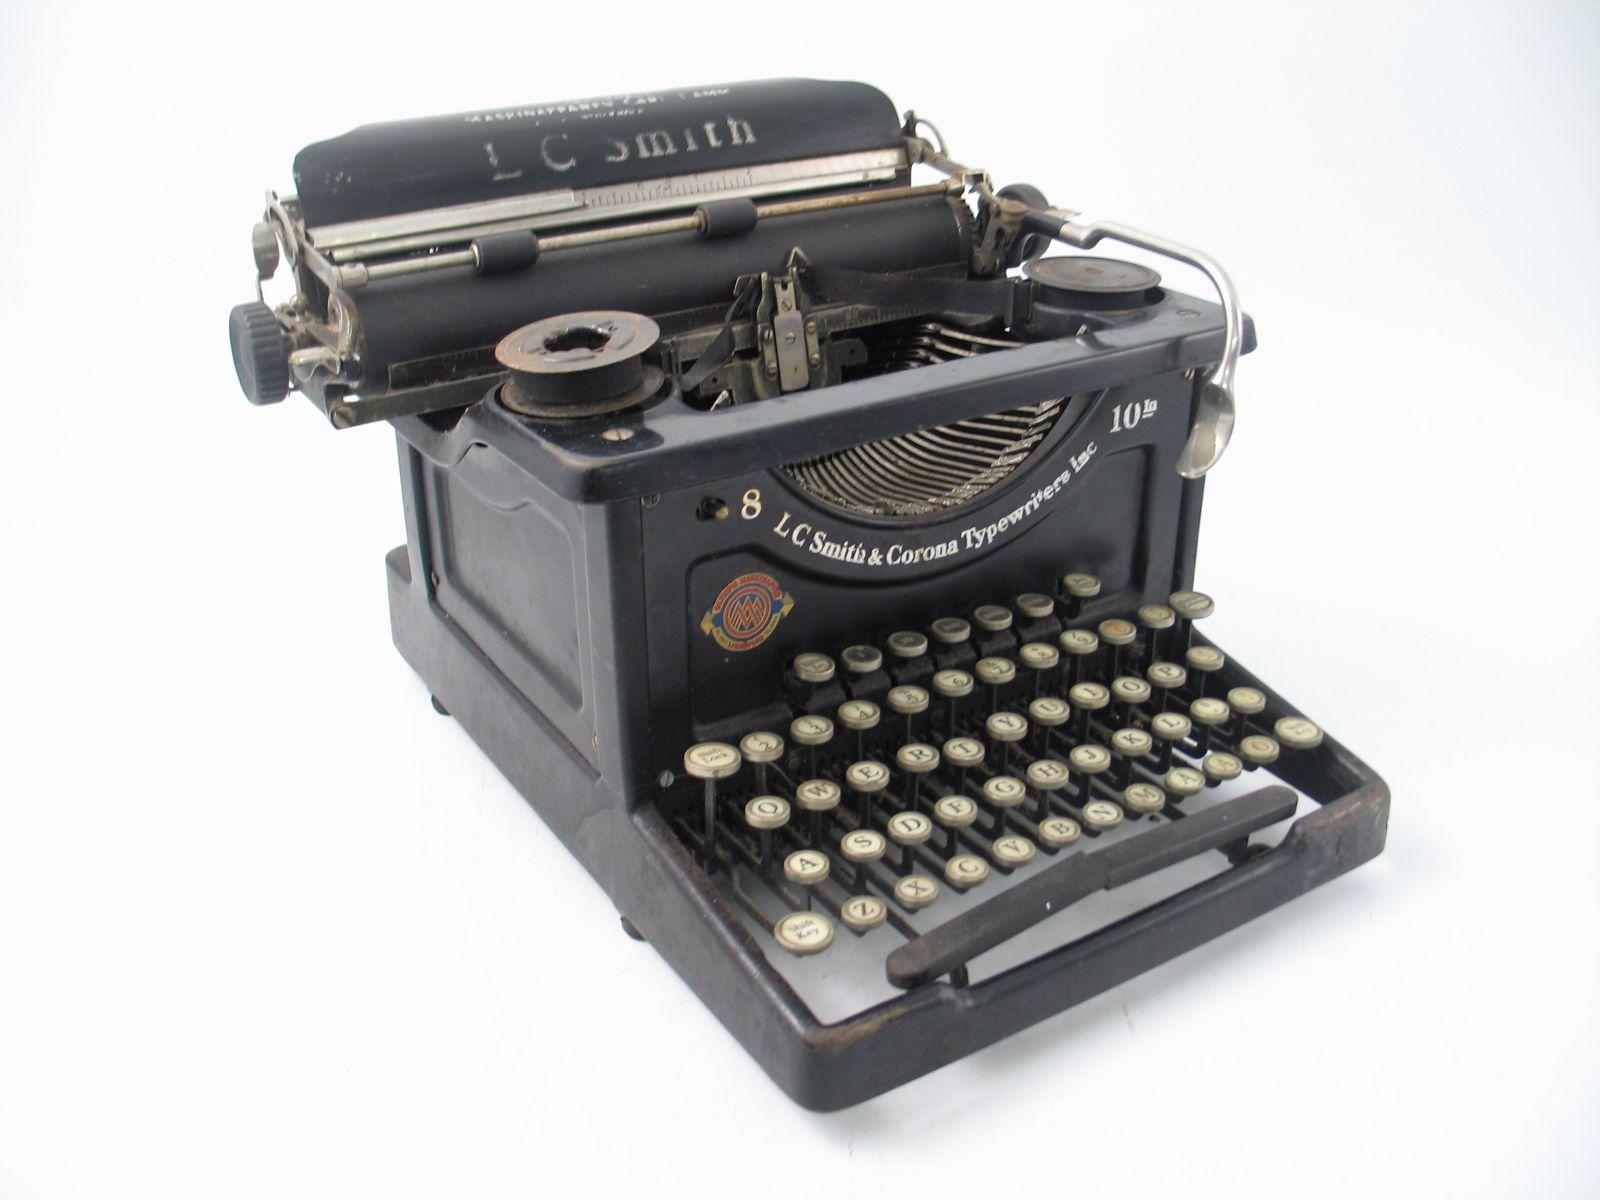 lc smith skrivmaskin